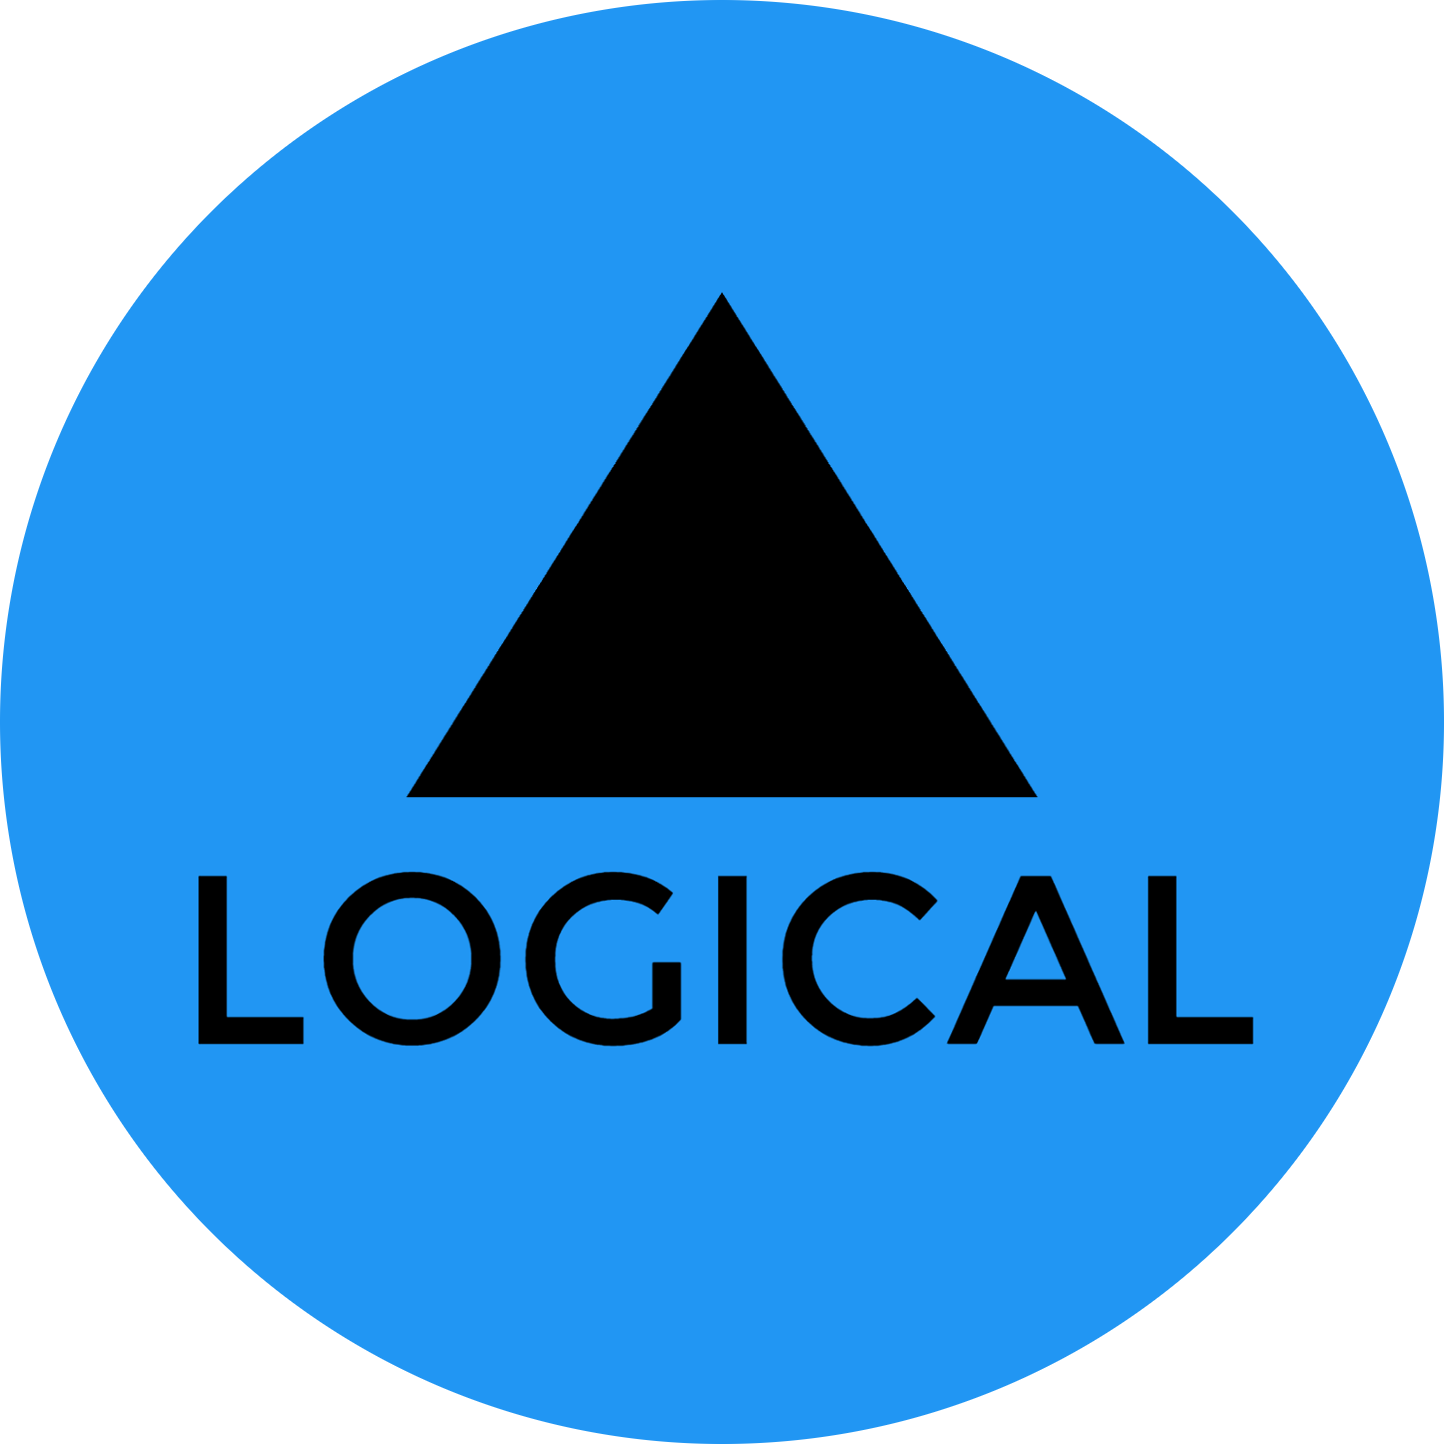 Logical logo